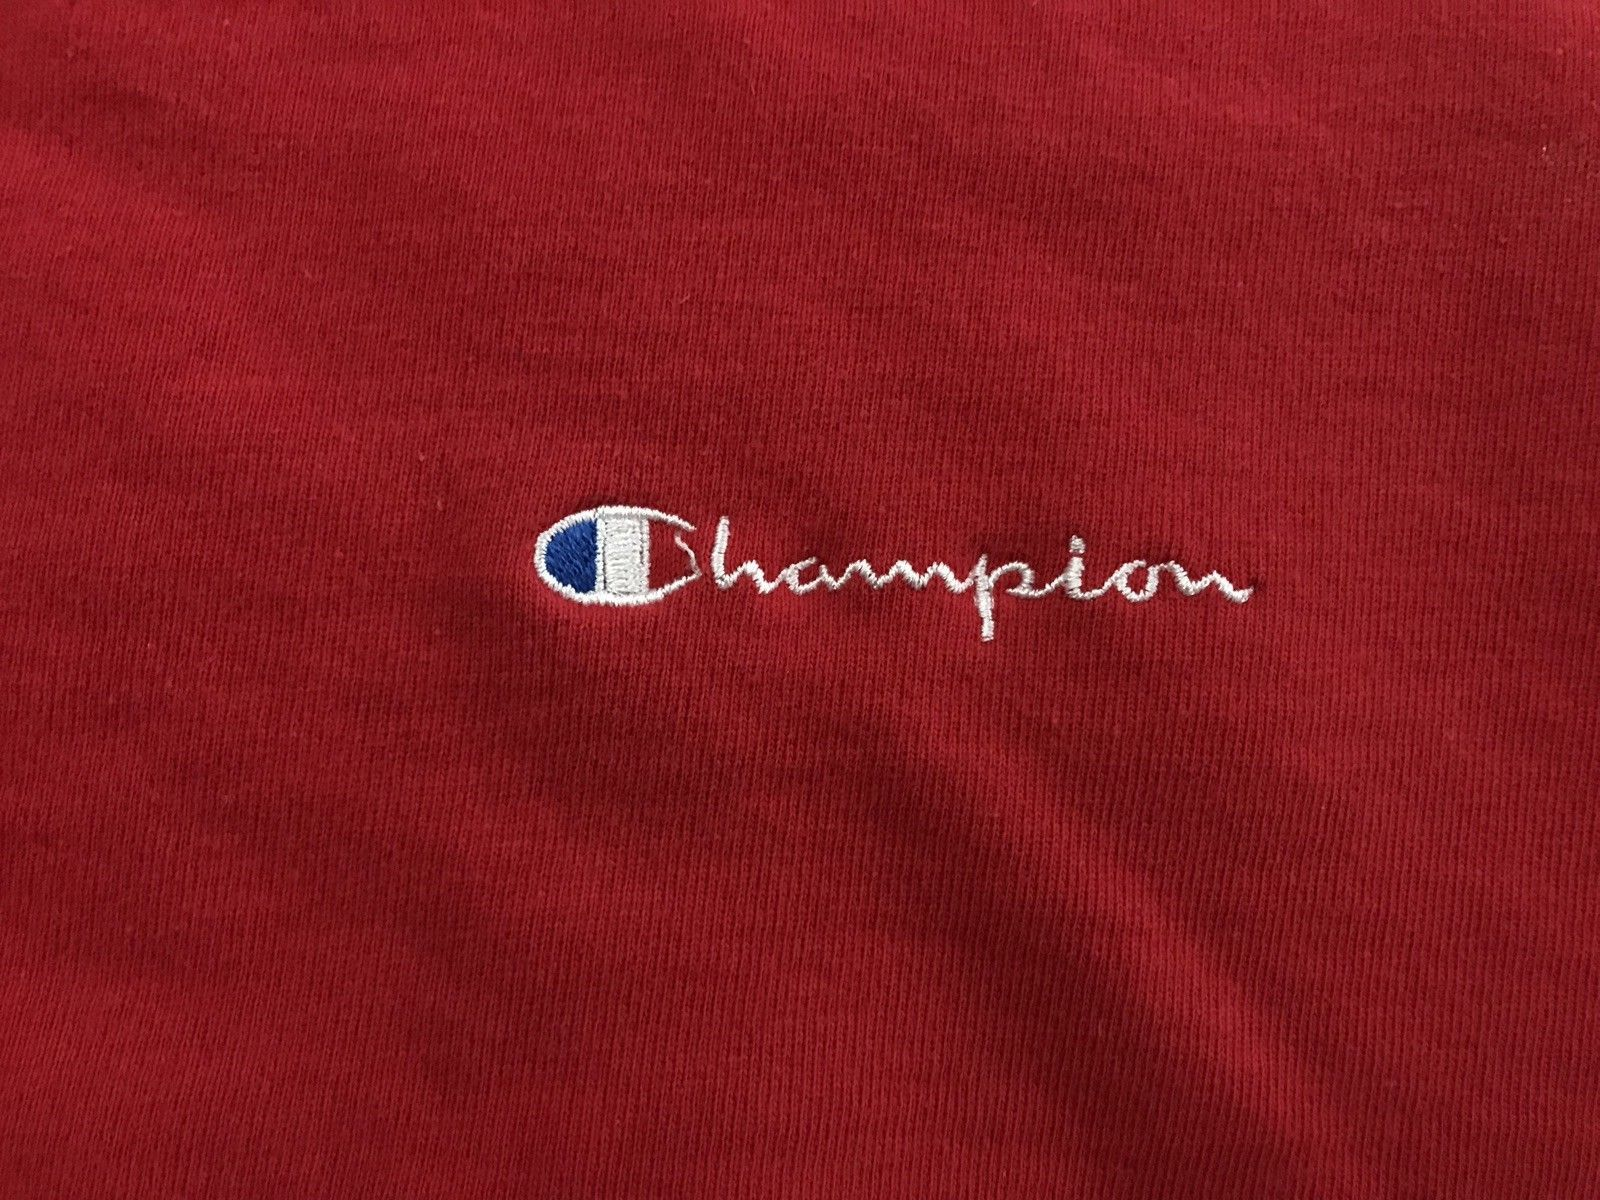 VINTAGE Champion Warmup Crewneck Sweatshirt Spell Out XL script 90s USA